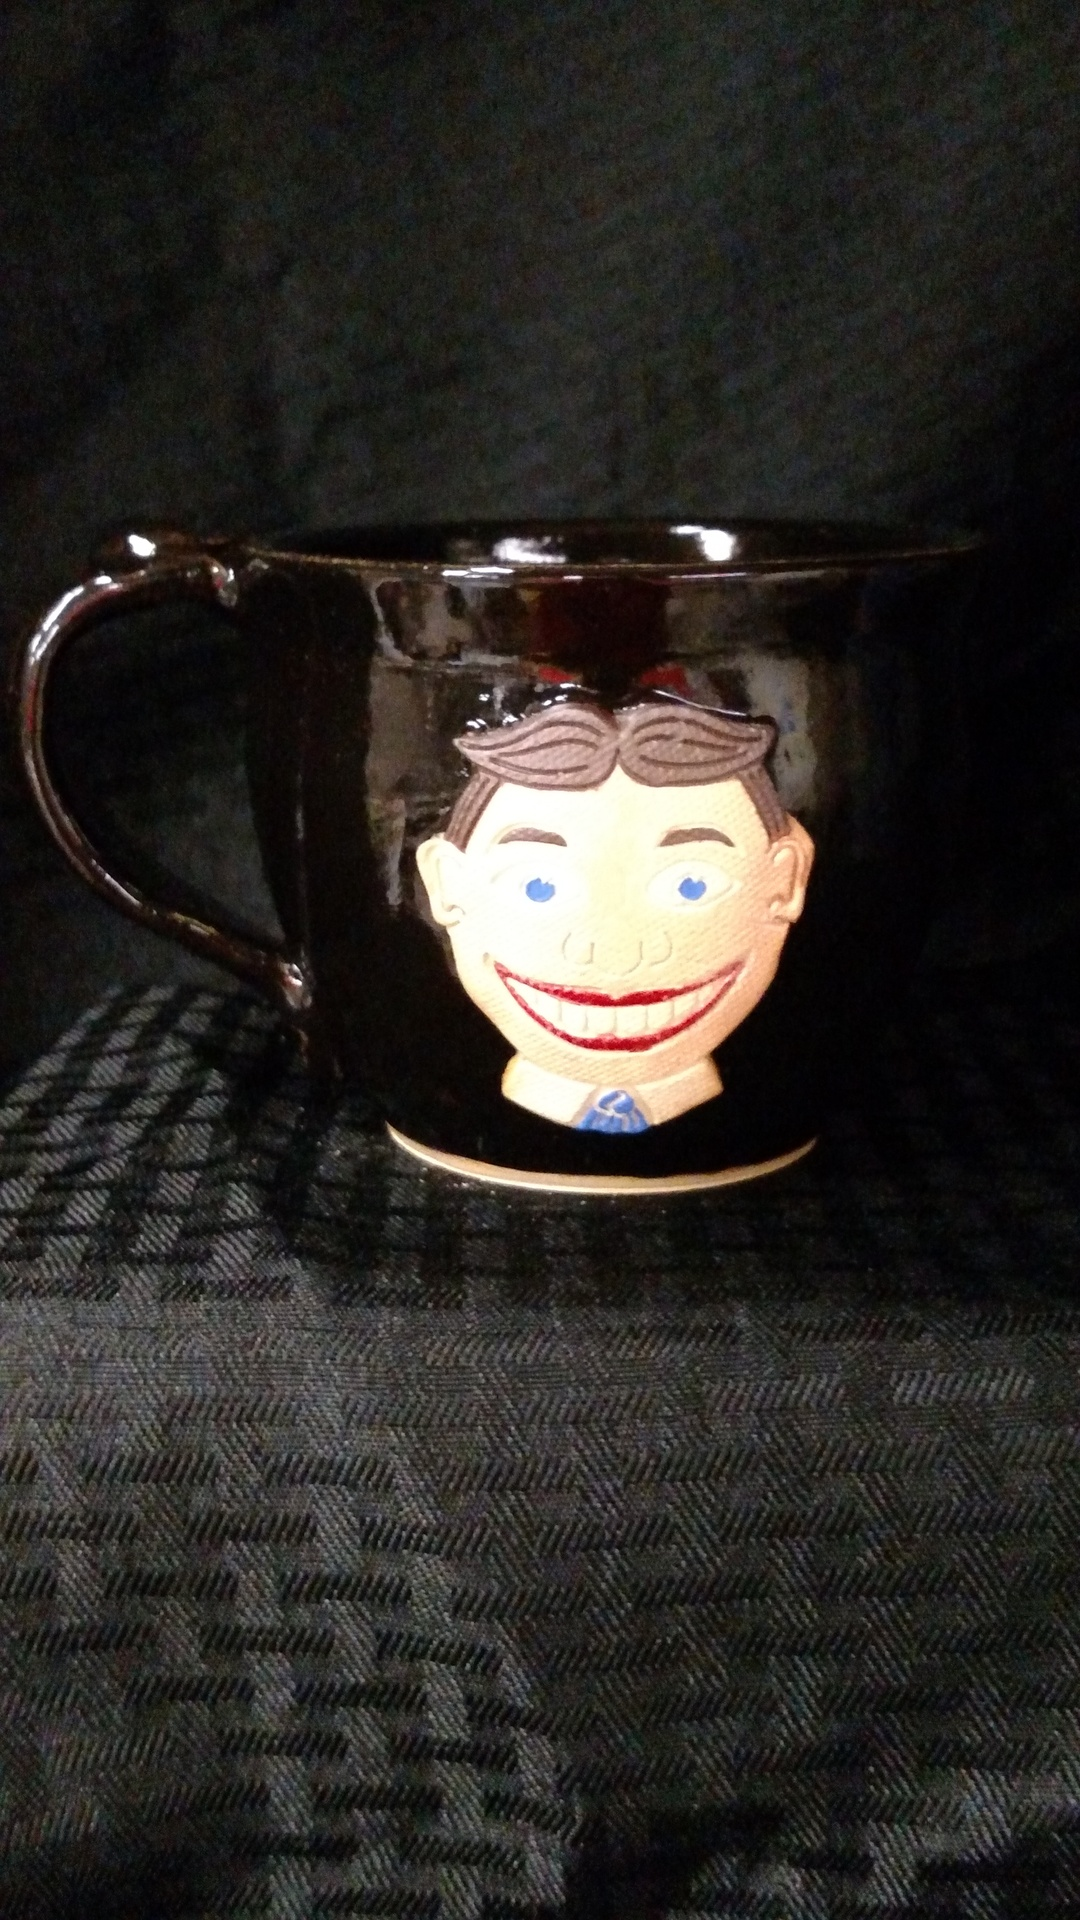 Tillie soup/capuccino/ice cream mug